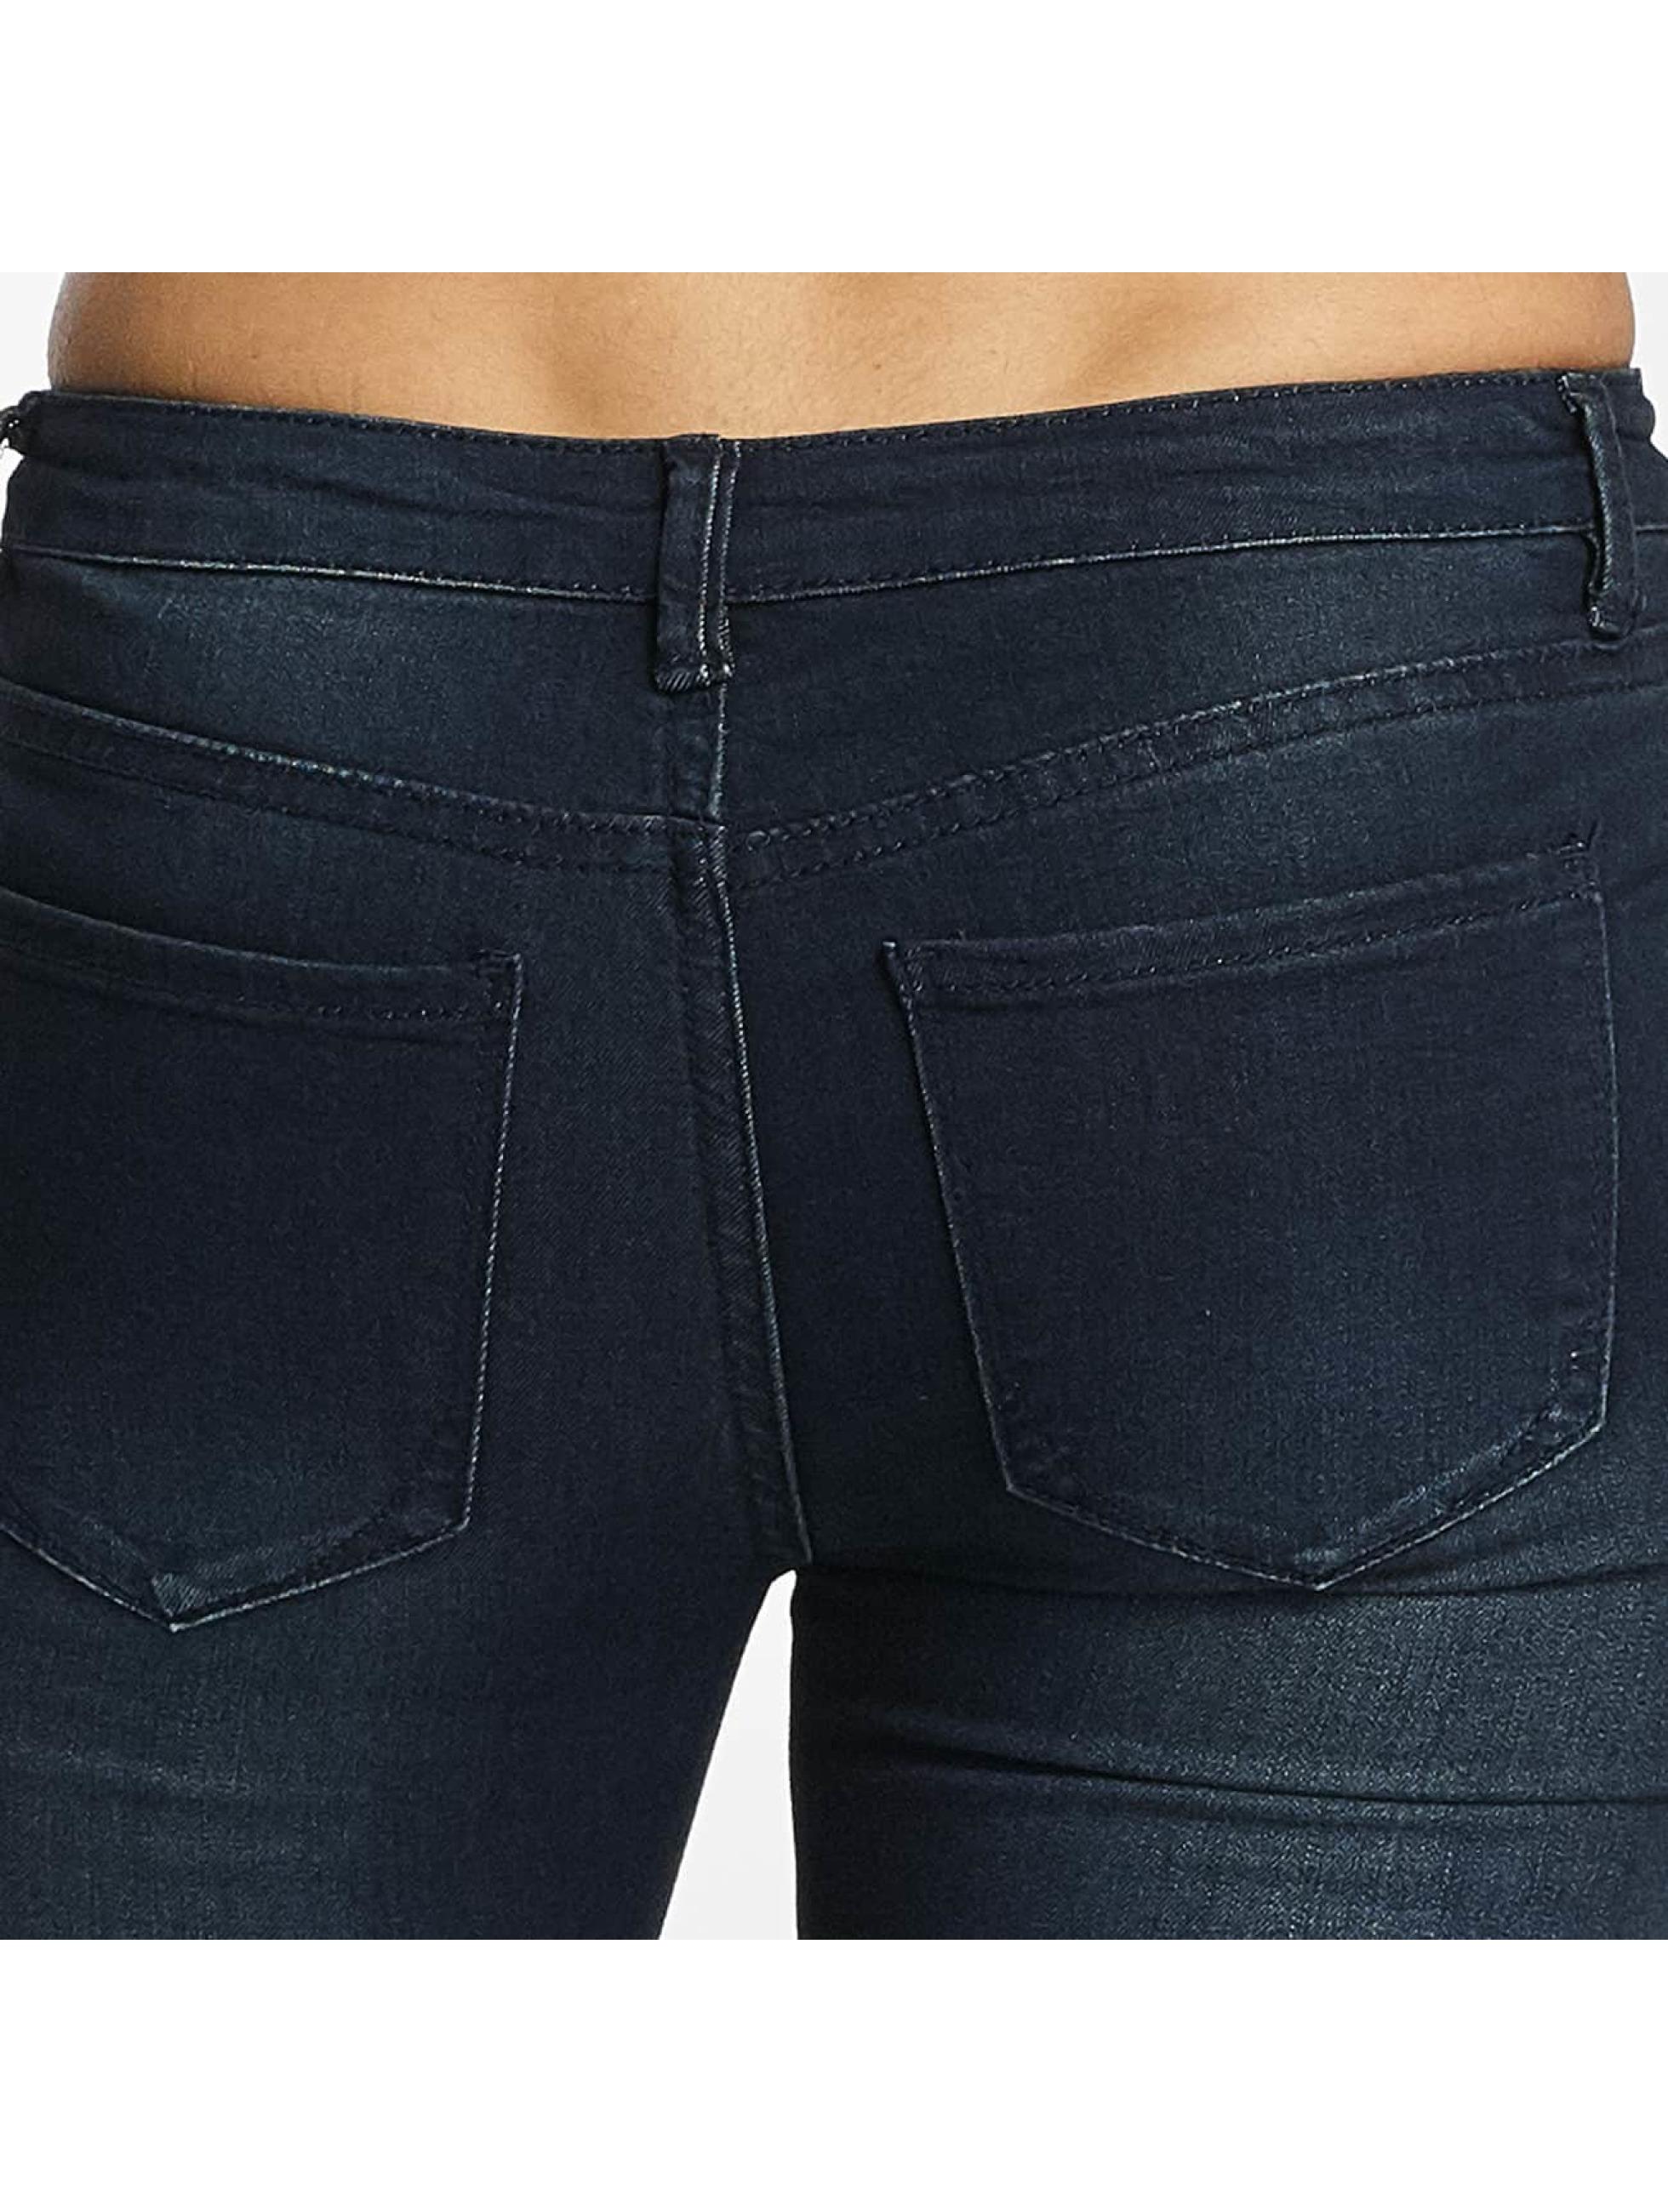 Hailys Skinny Jeans Mia Basic schwarz